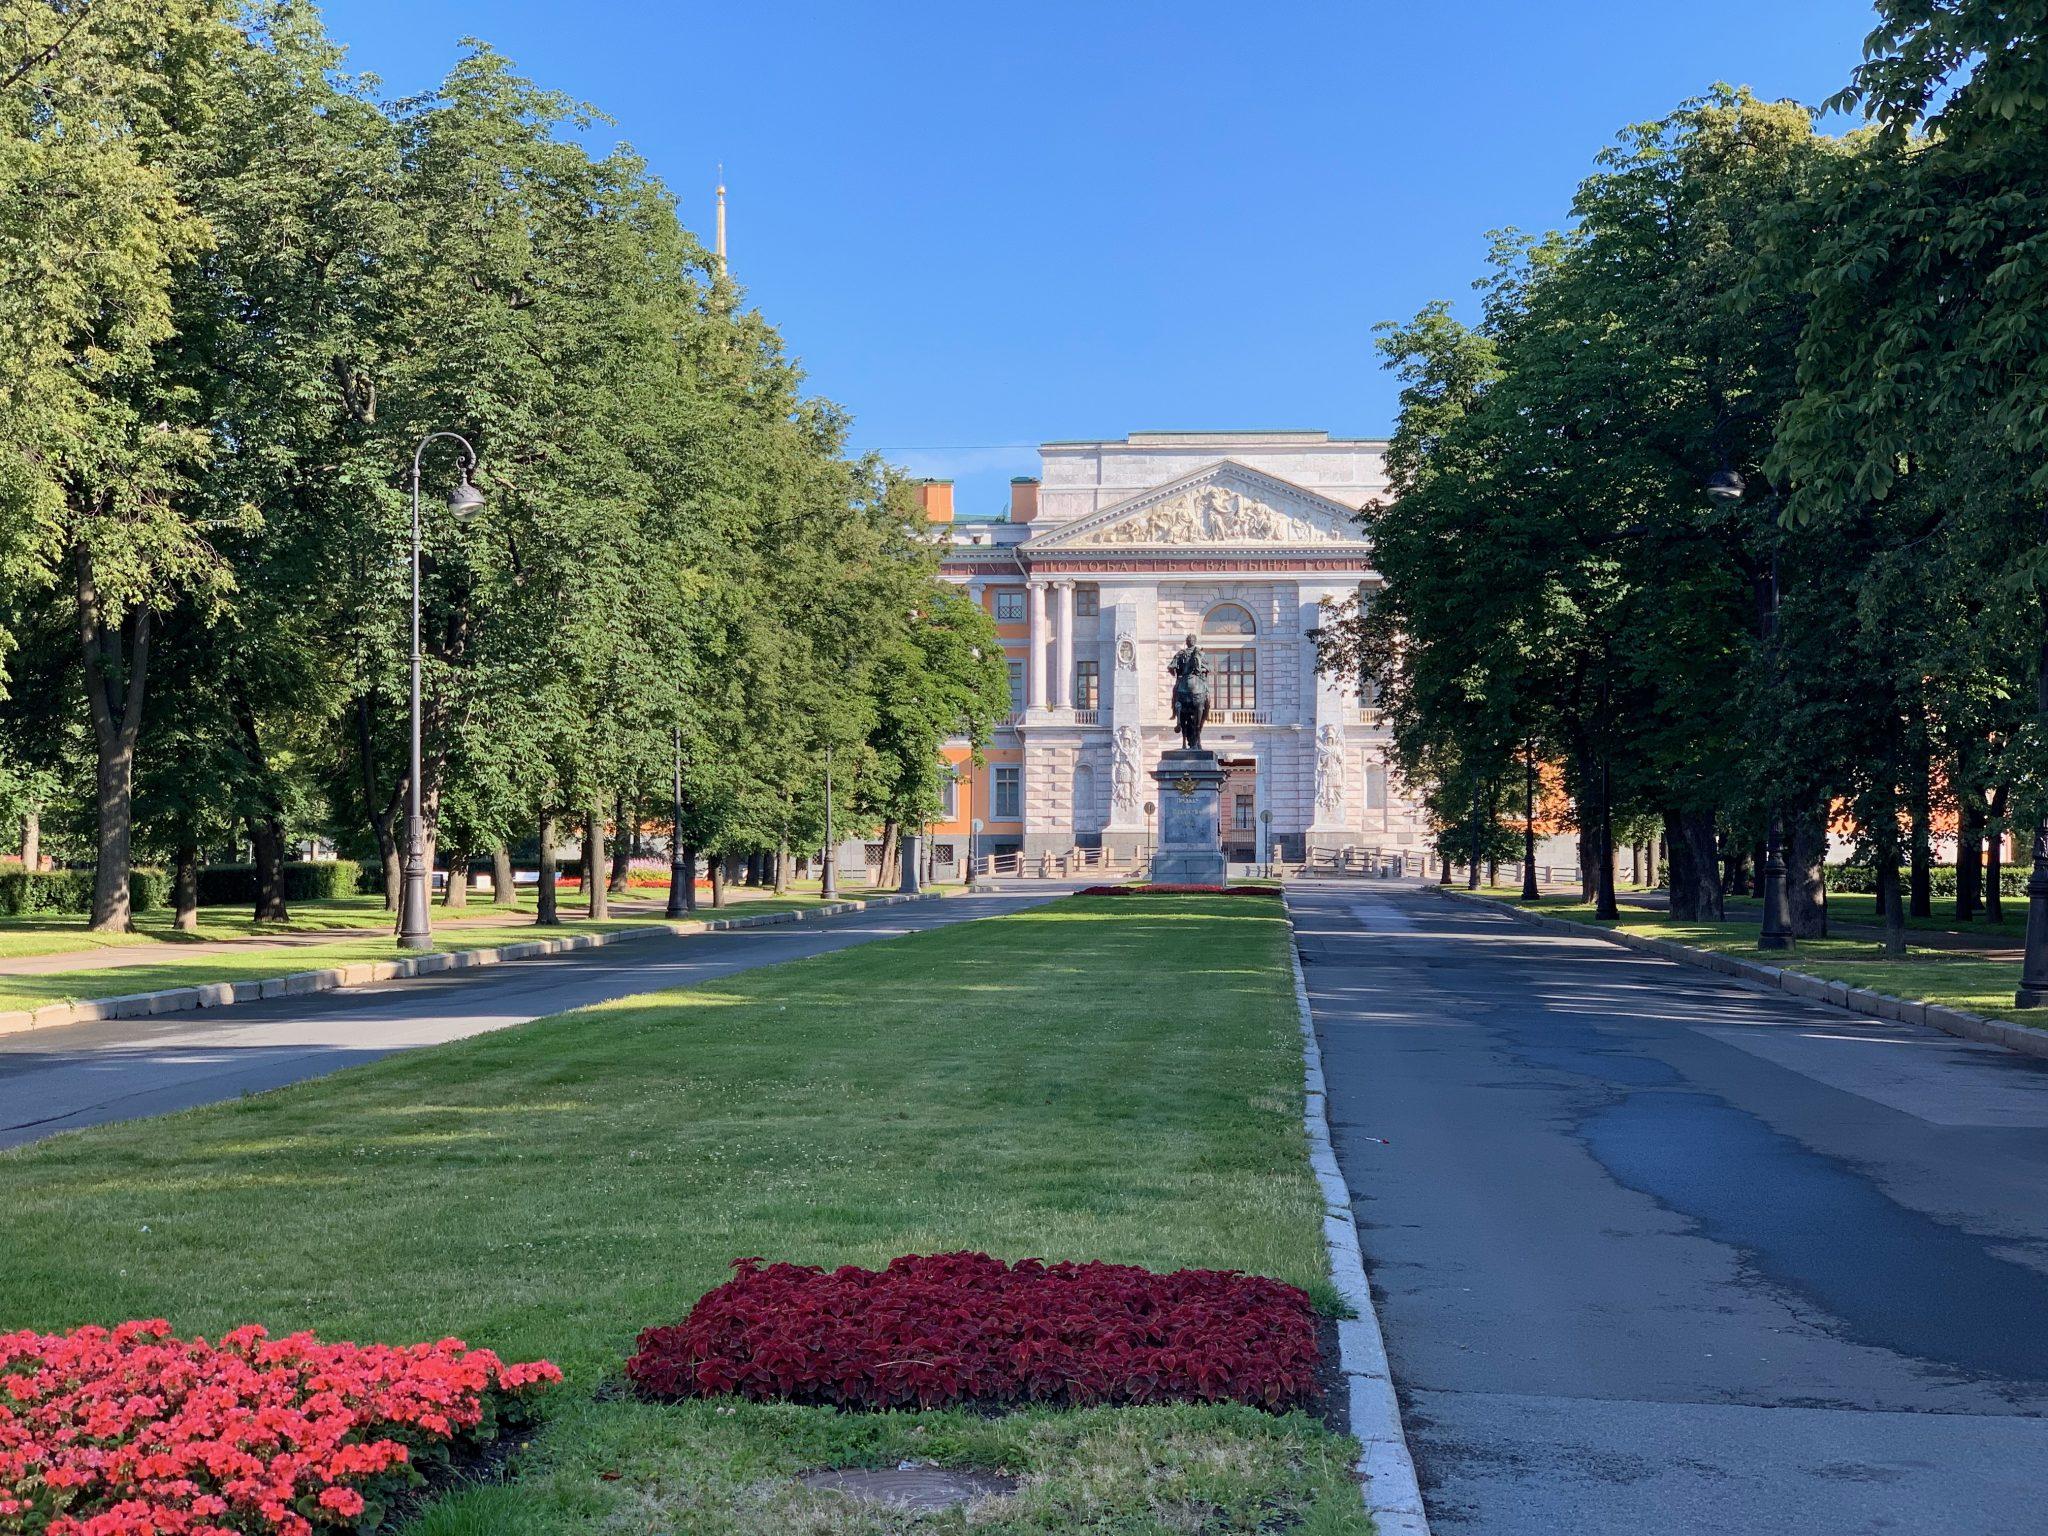 Peter statue Saint Petersburg